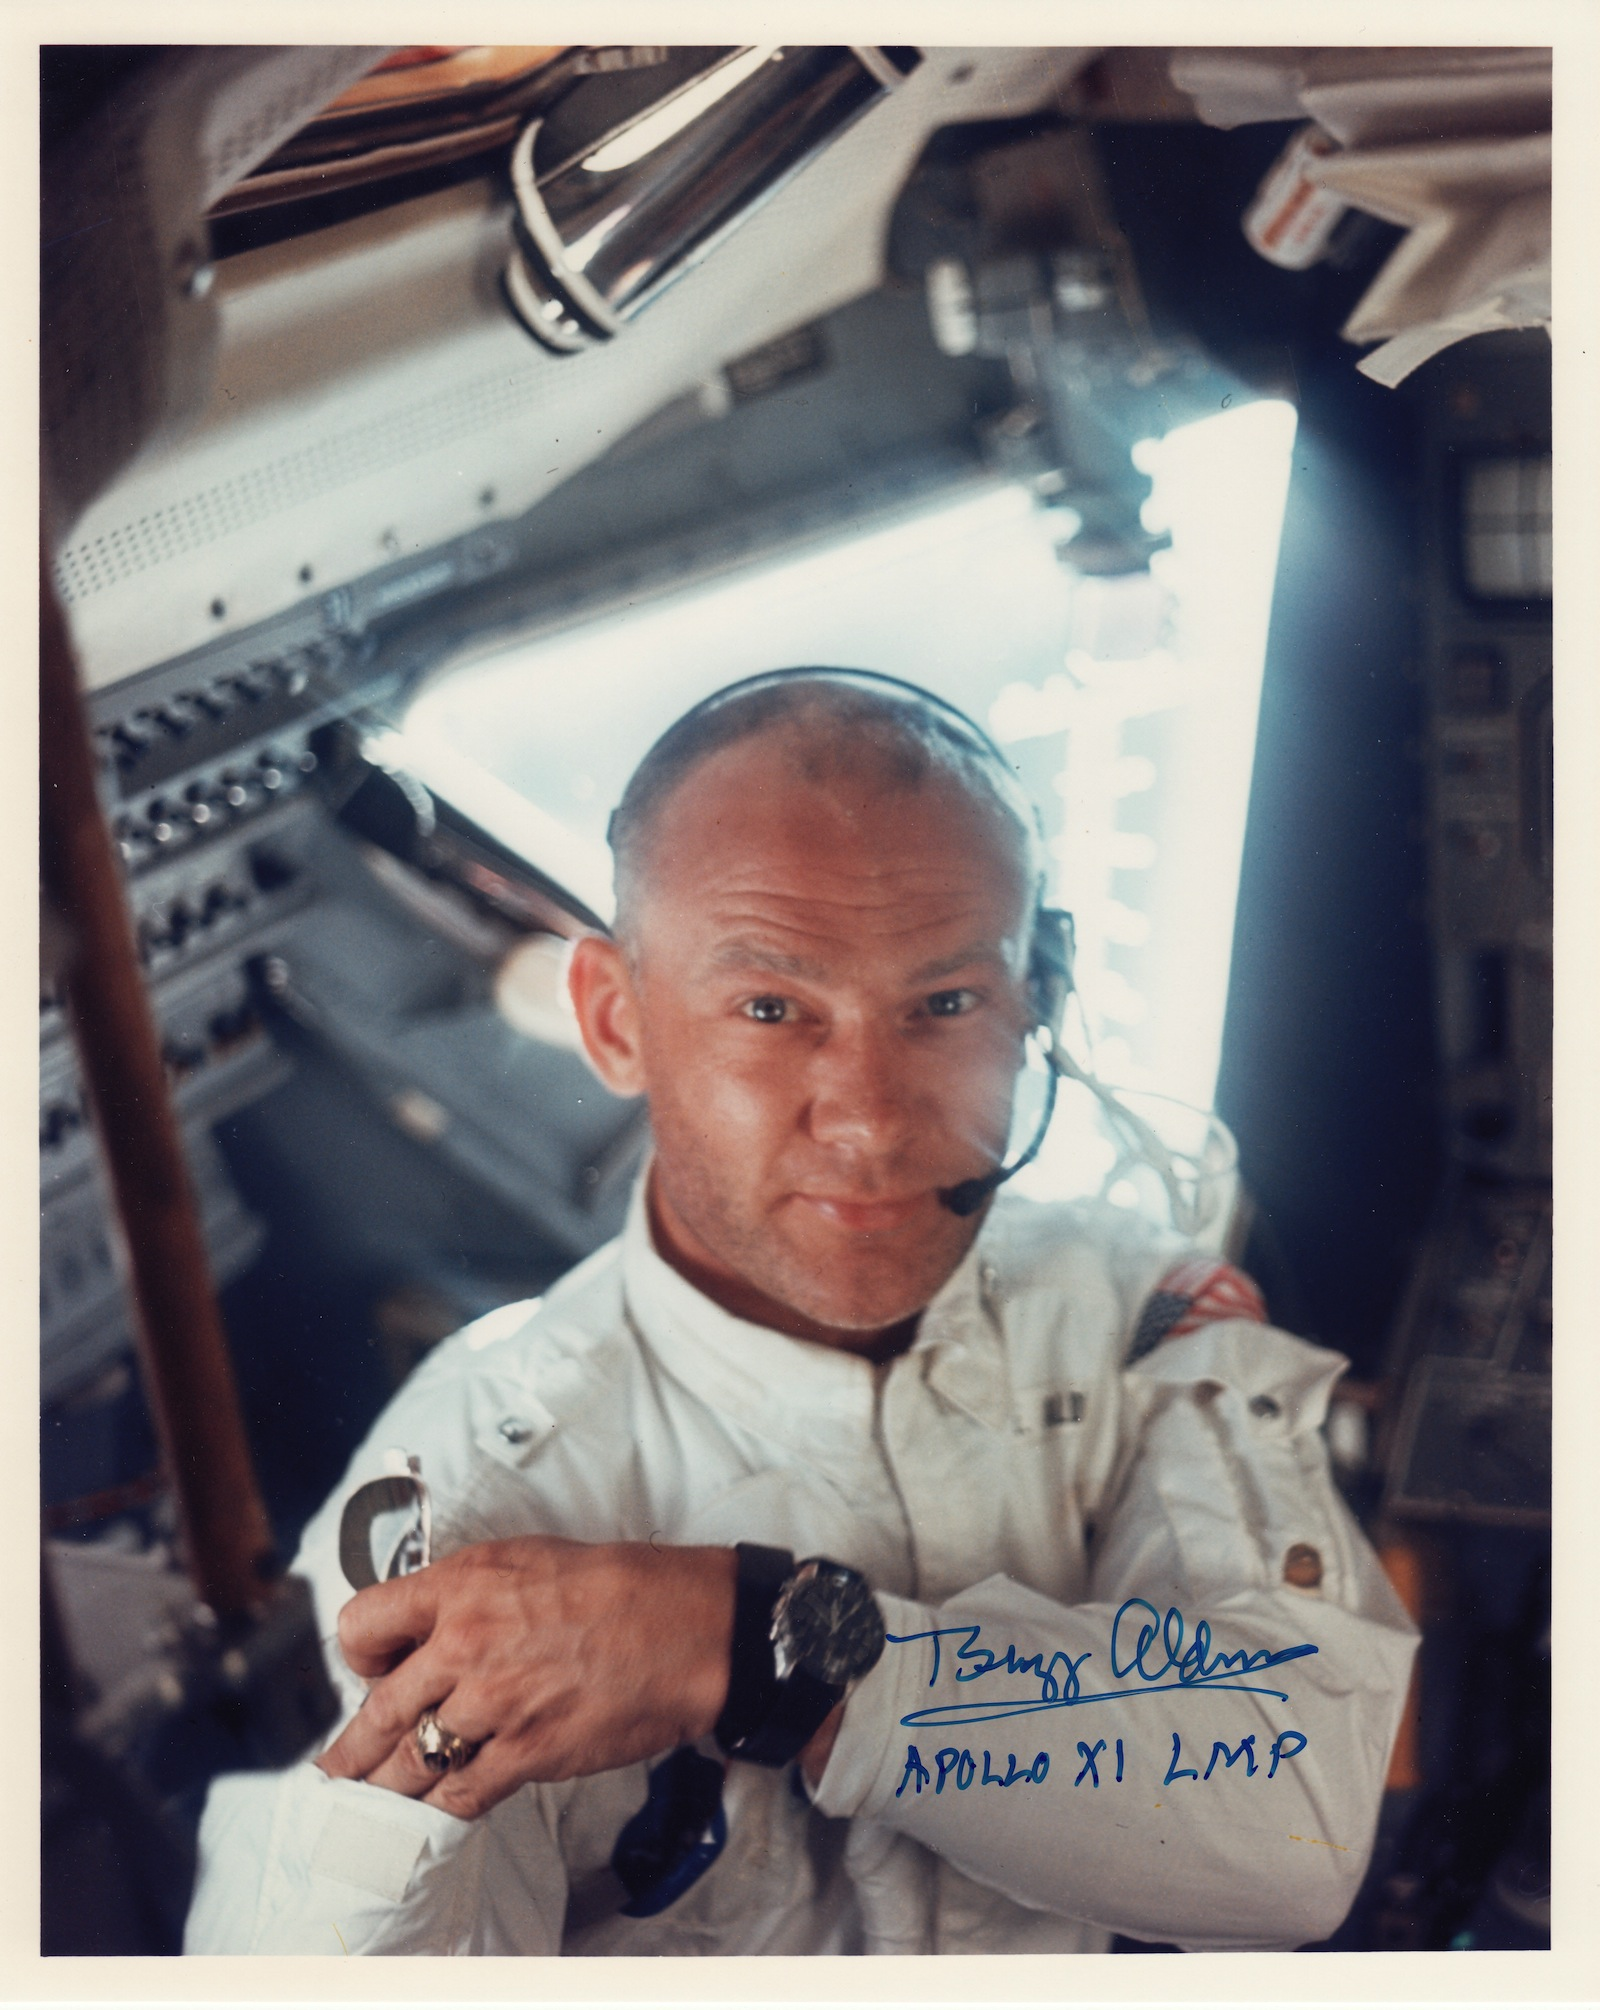 Buzz Aldrin Buzz Aldrin